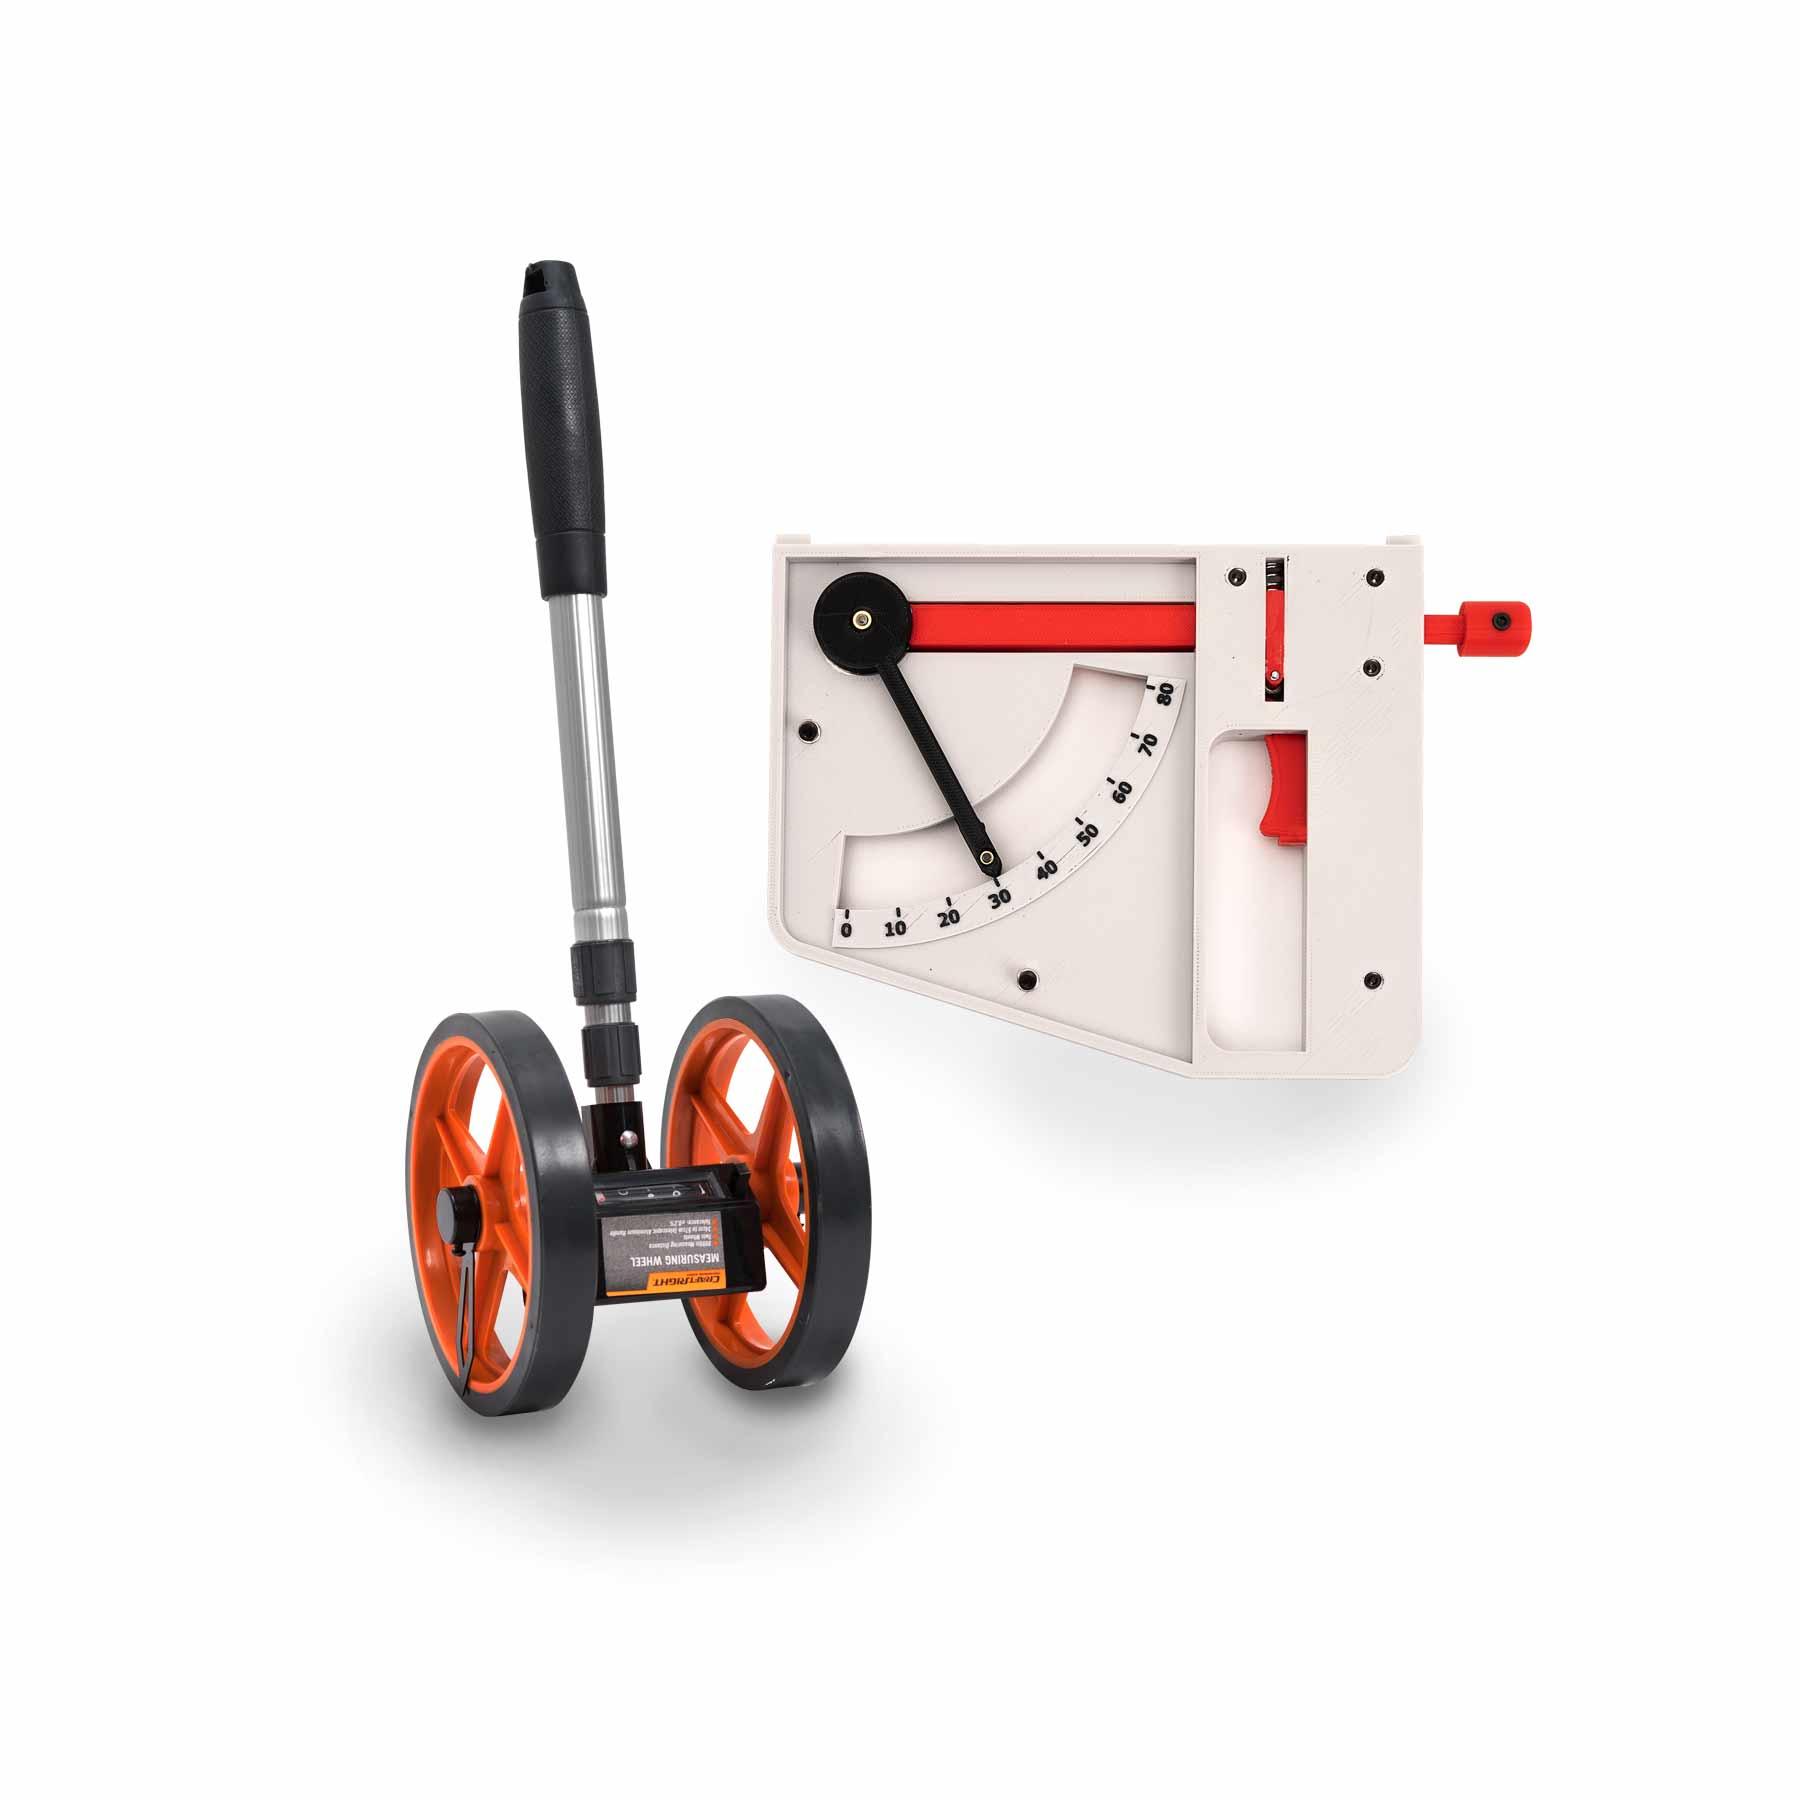 Measuring wheel clinometer angle tracker